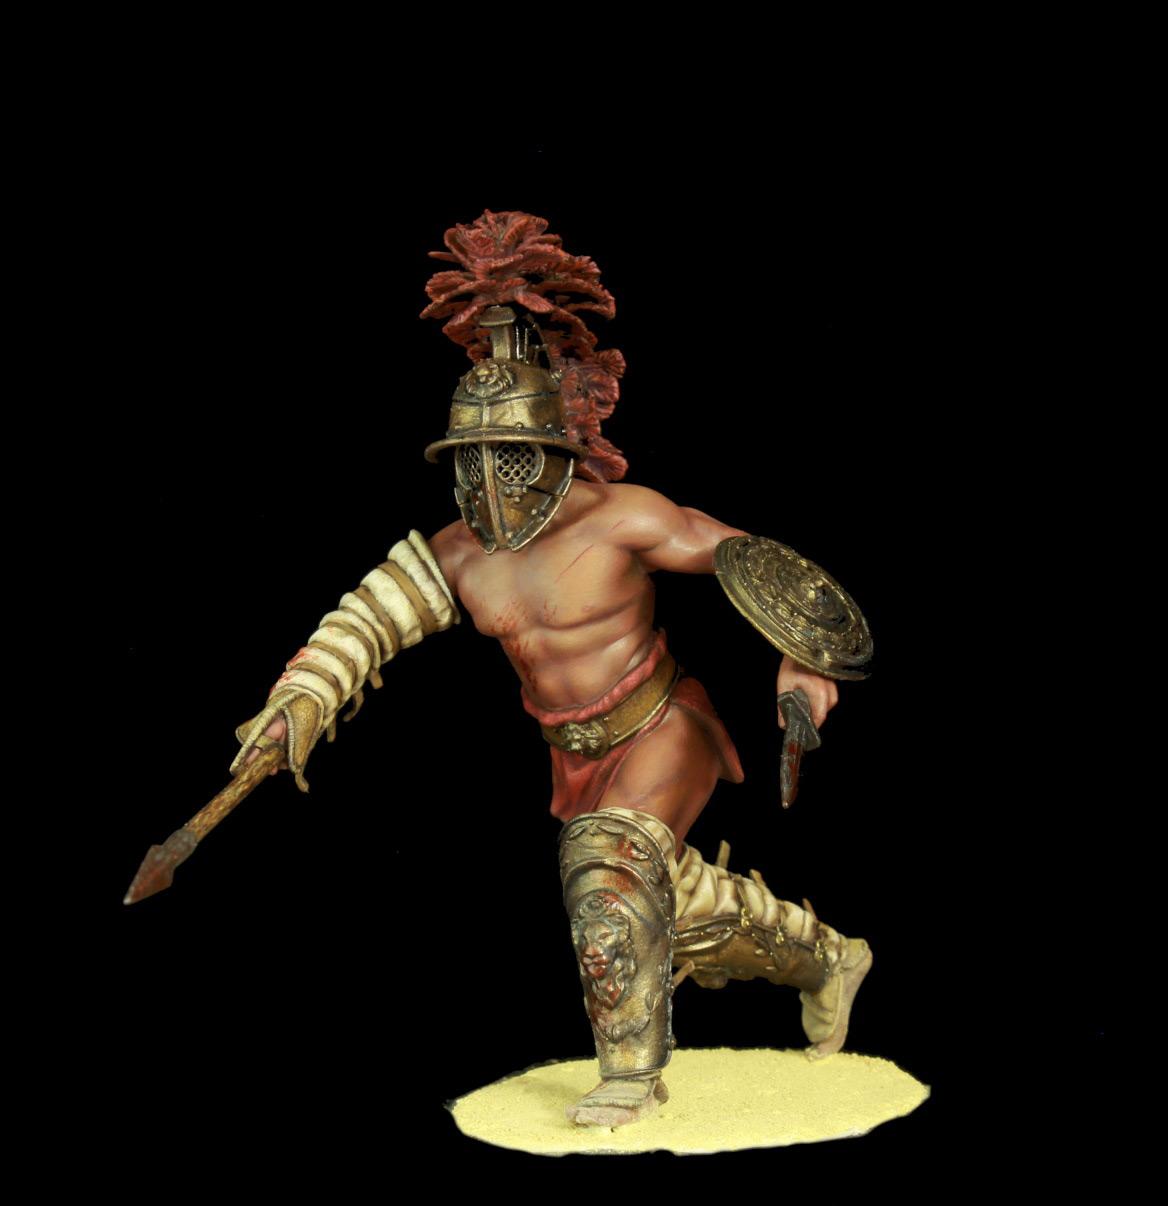 Figures: Hoplomachus, photo #7